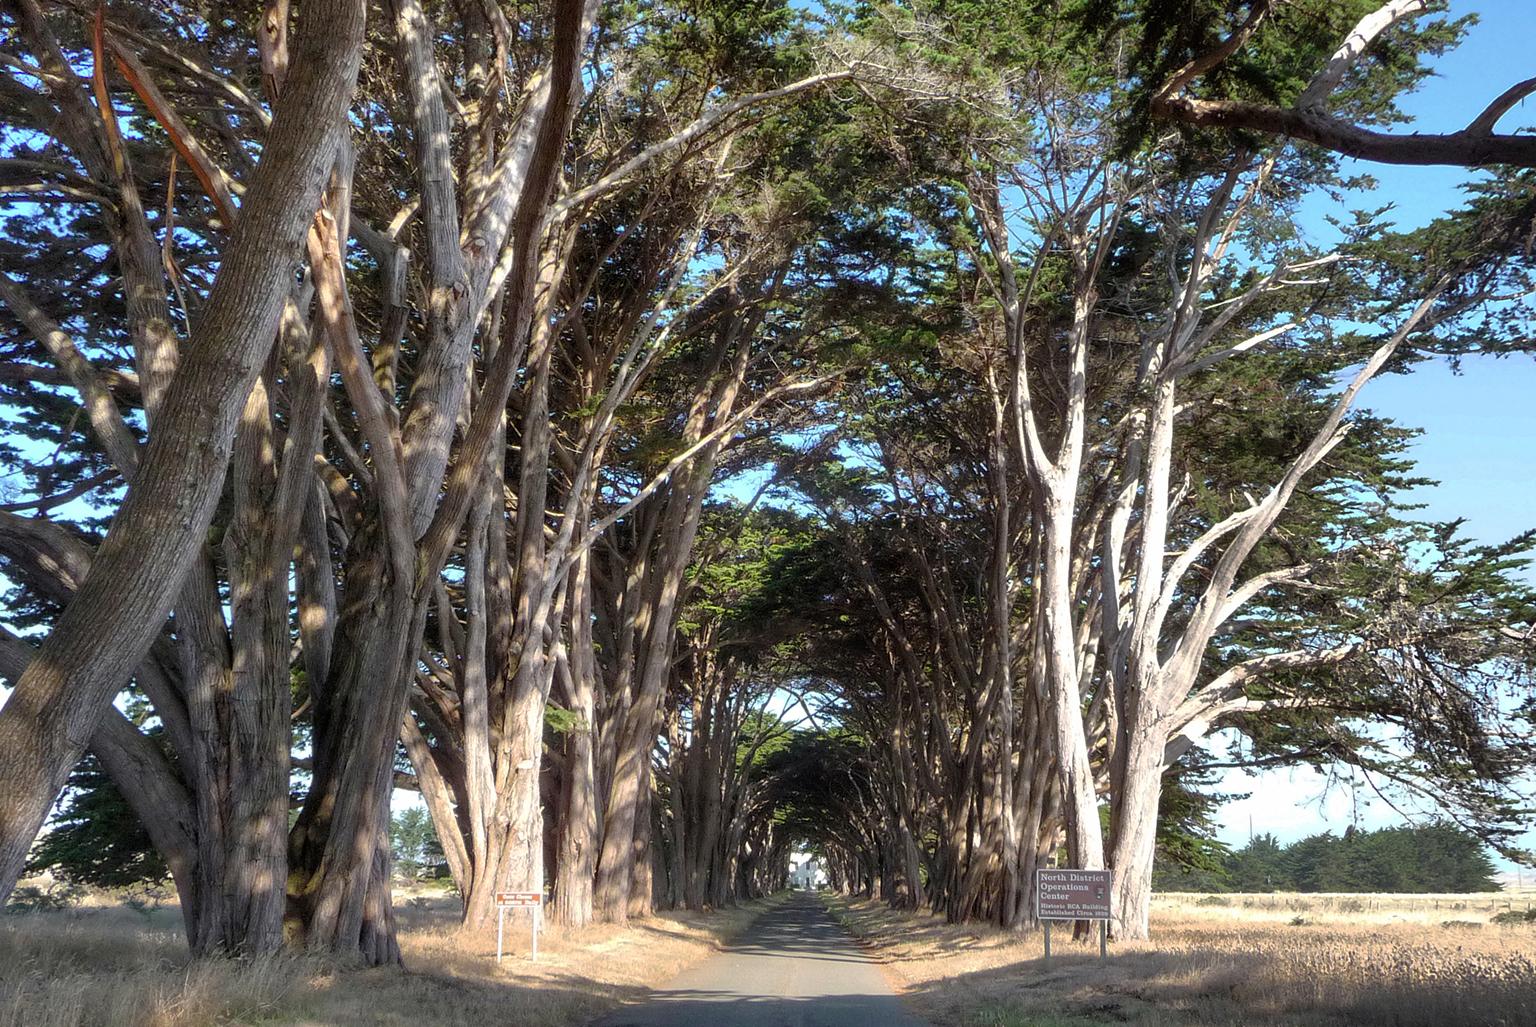 Point Reyes Marconi Station Cultural Landscape Report